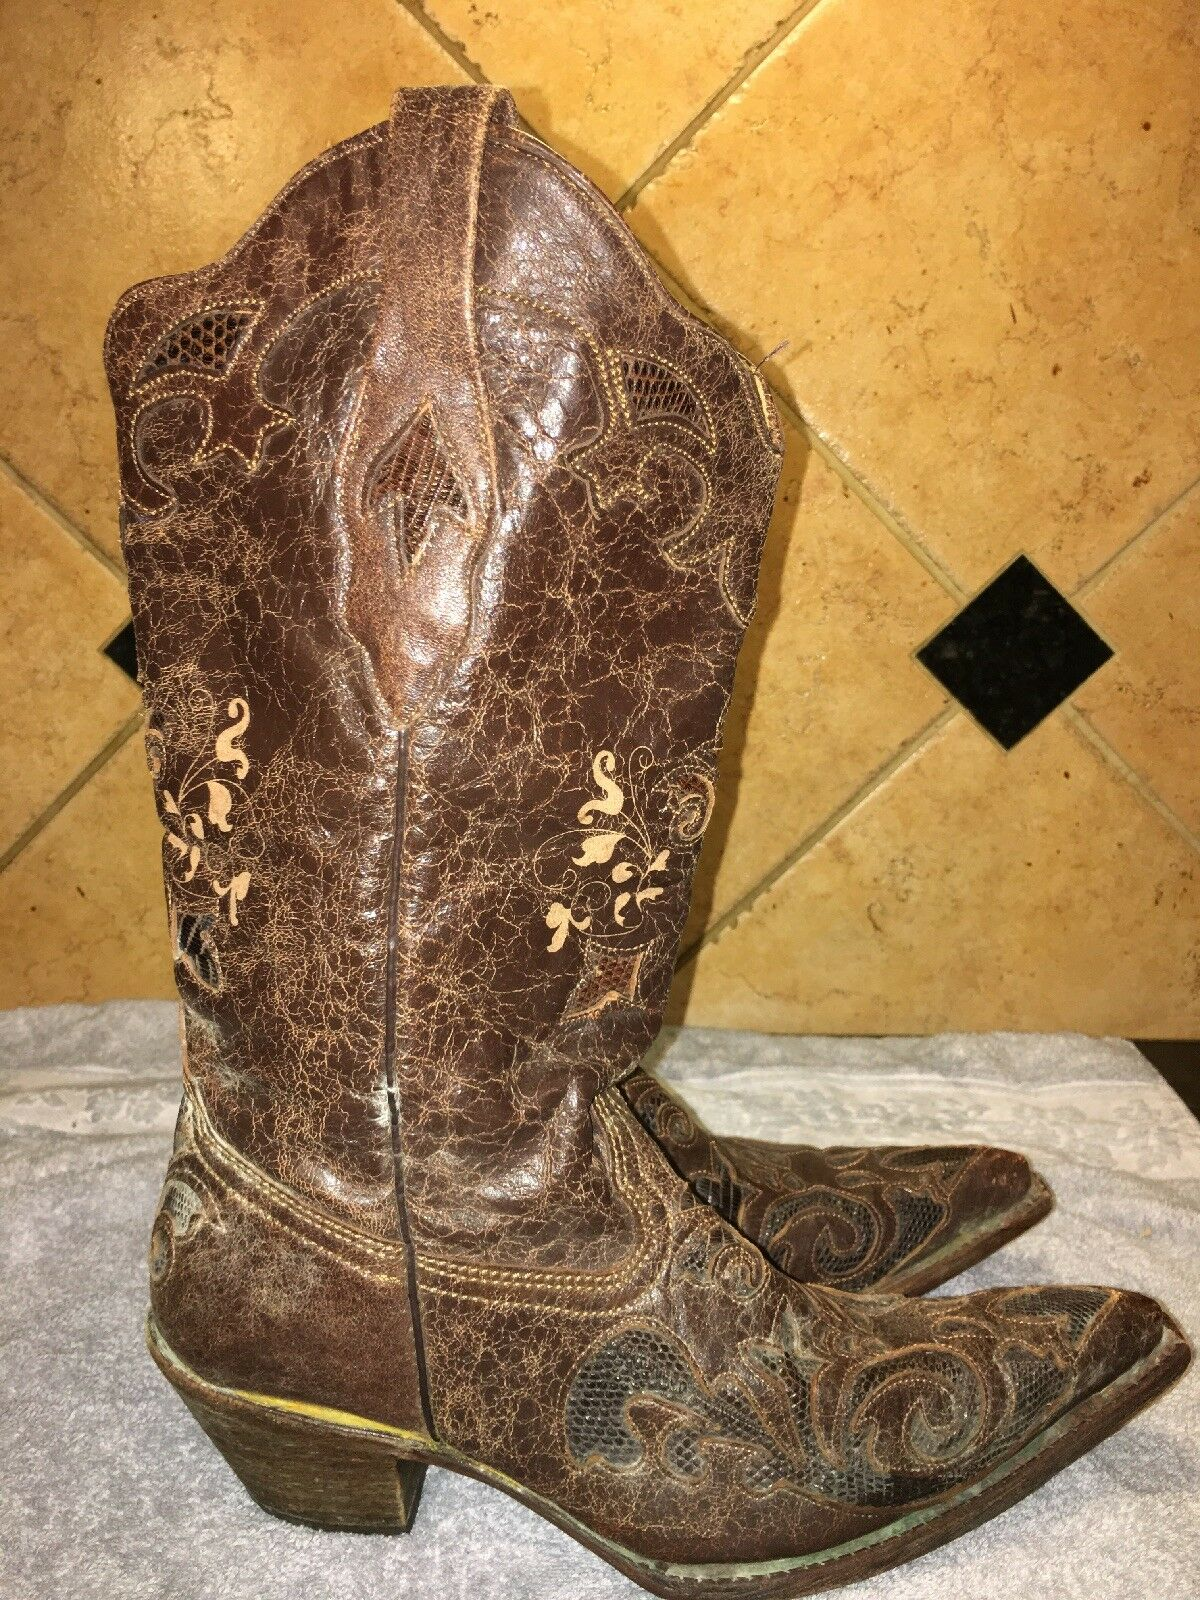 Corral marron lézard en cuir Cowboy Western bottes taille 9 1 2 9.5 M